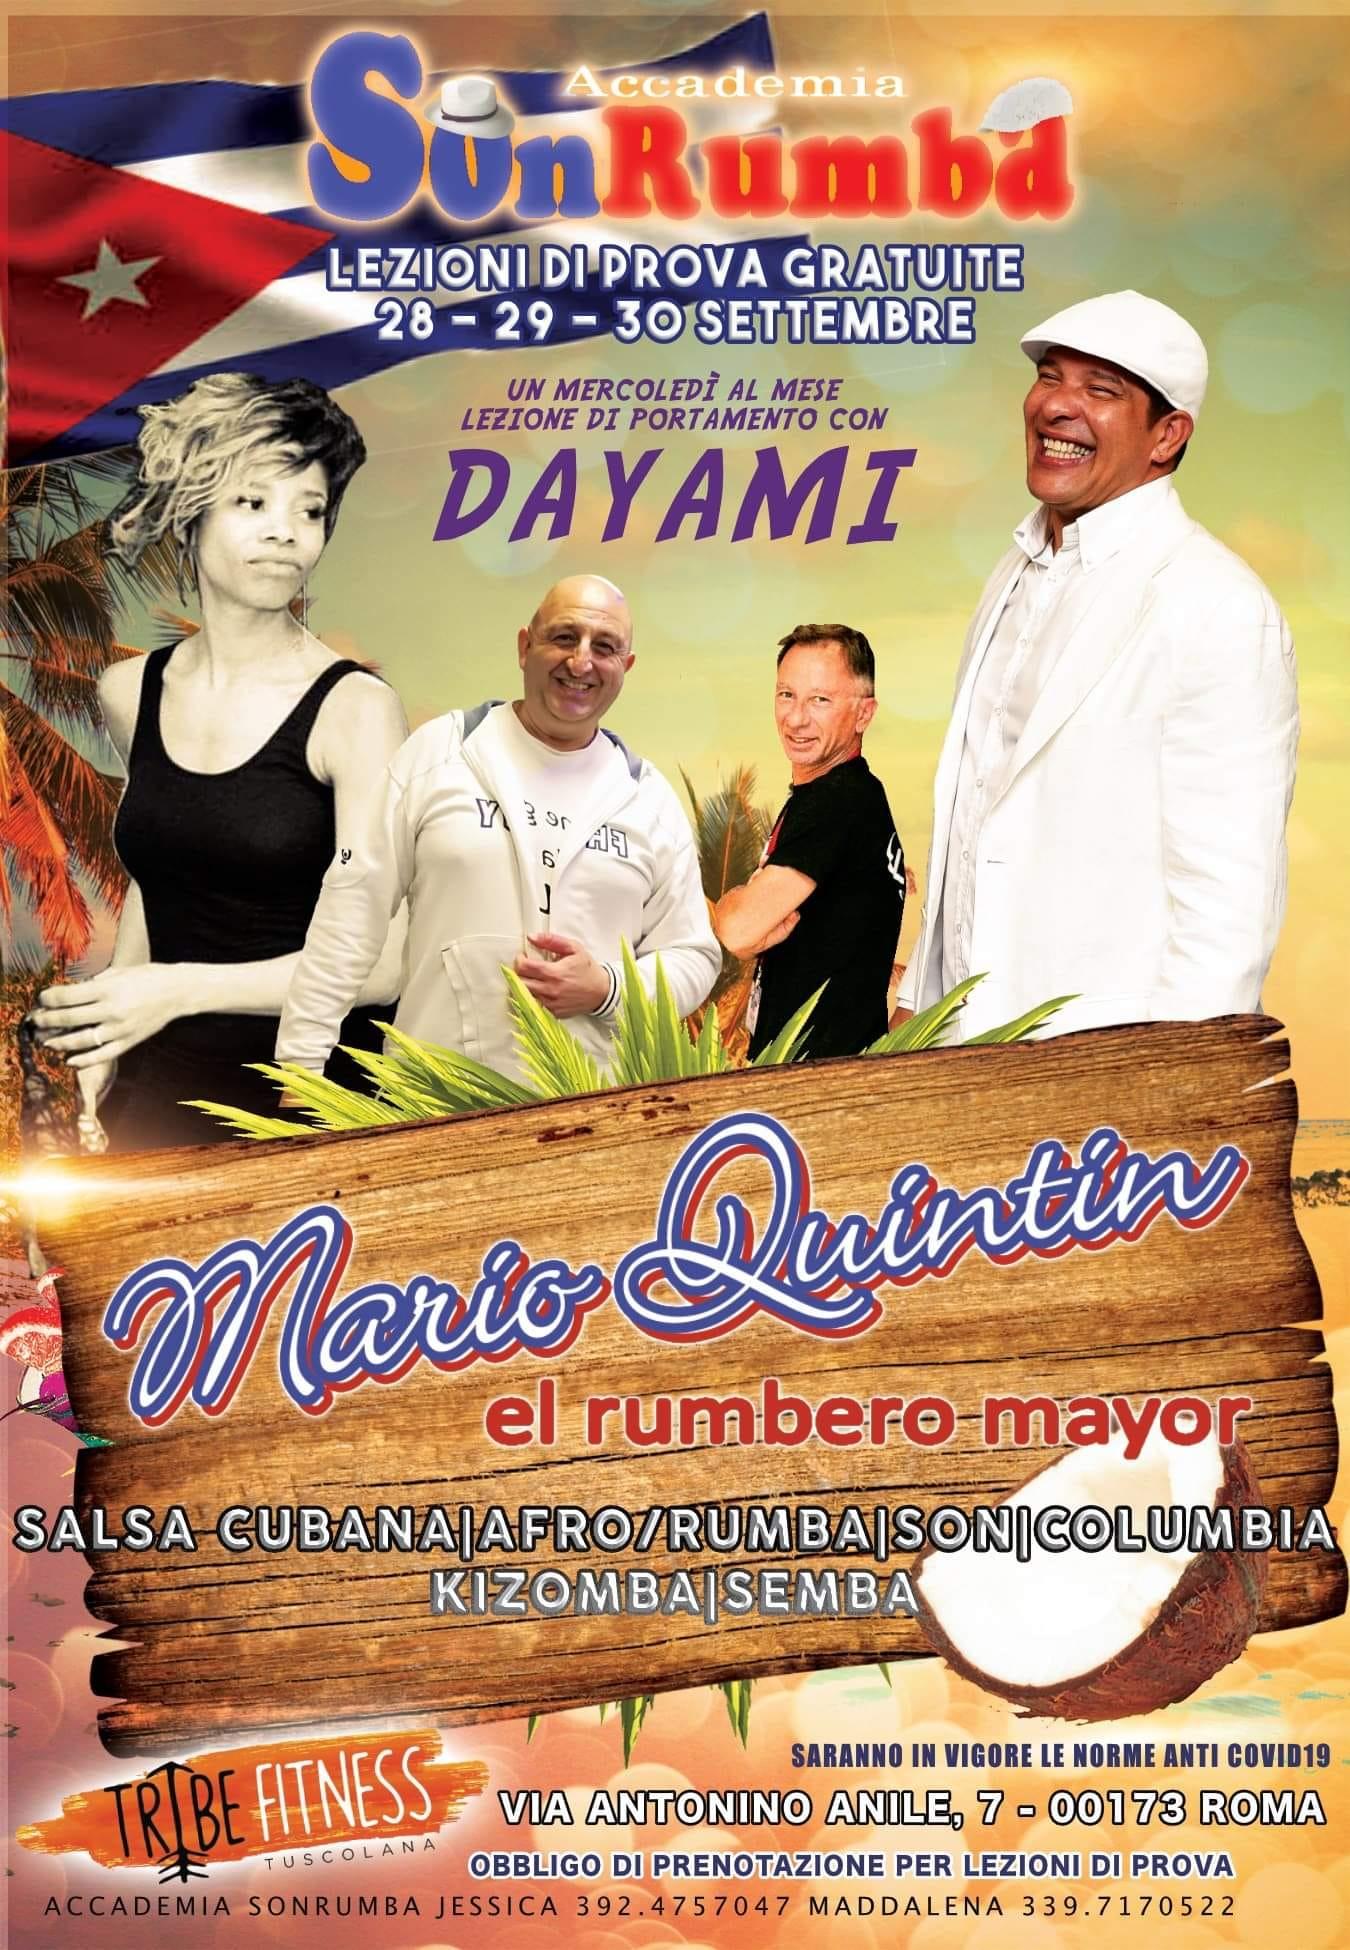 marioquintin corsi salsa afro rumba son columbia kizomba semba roma